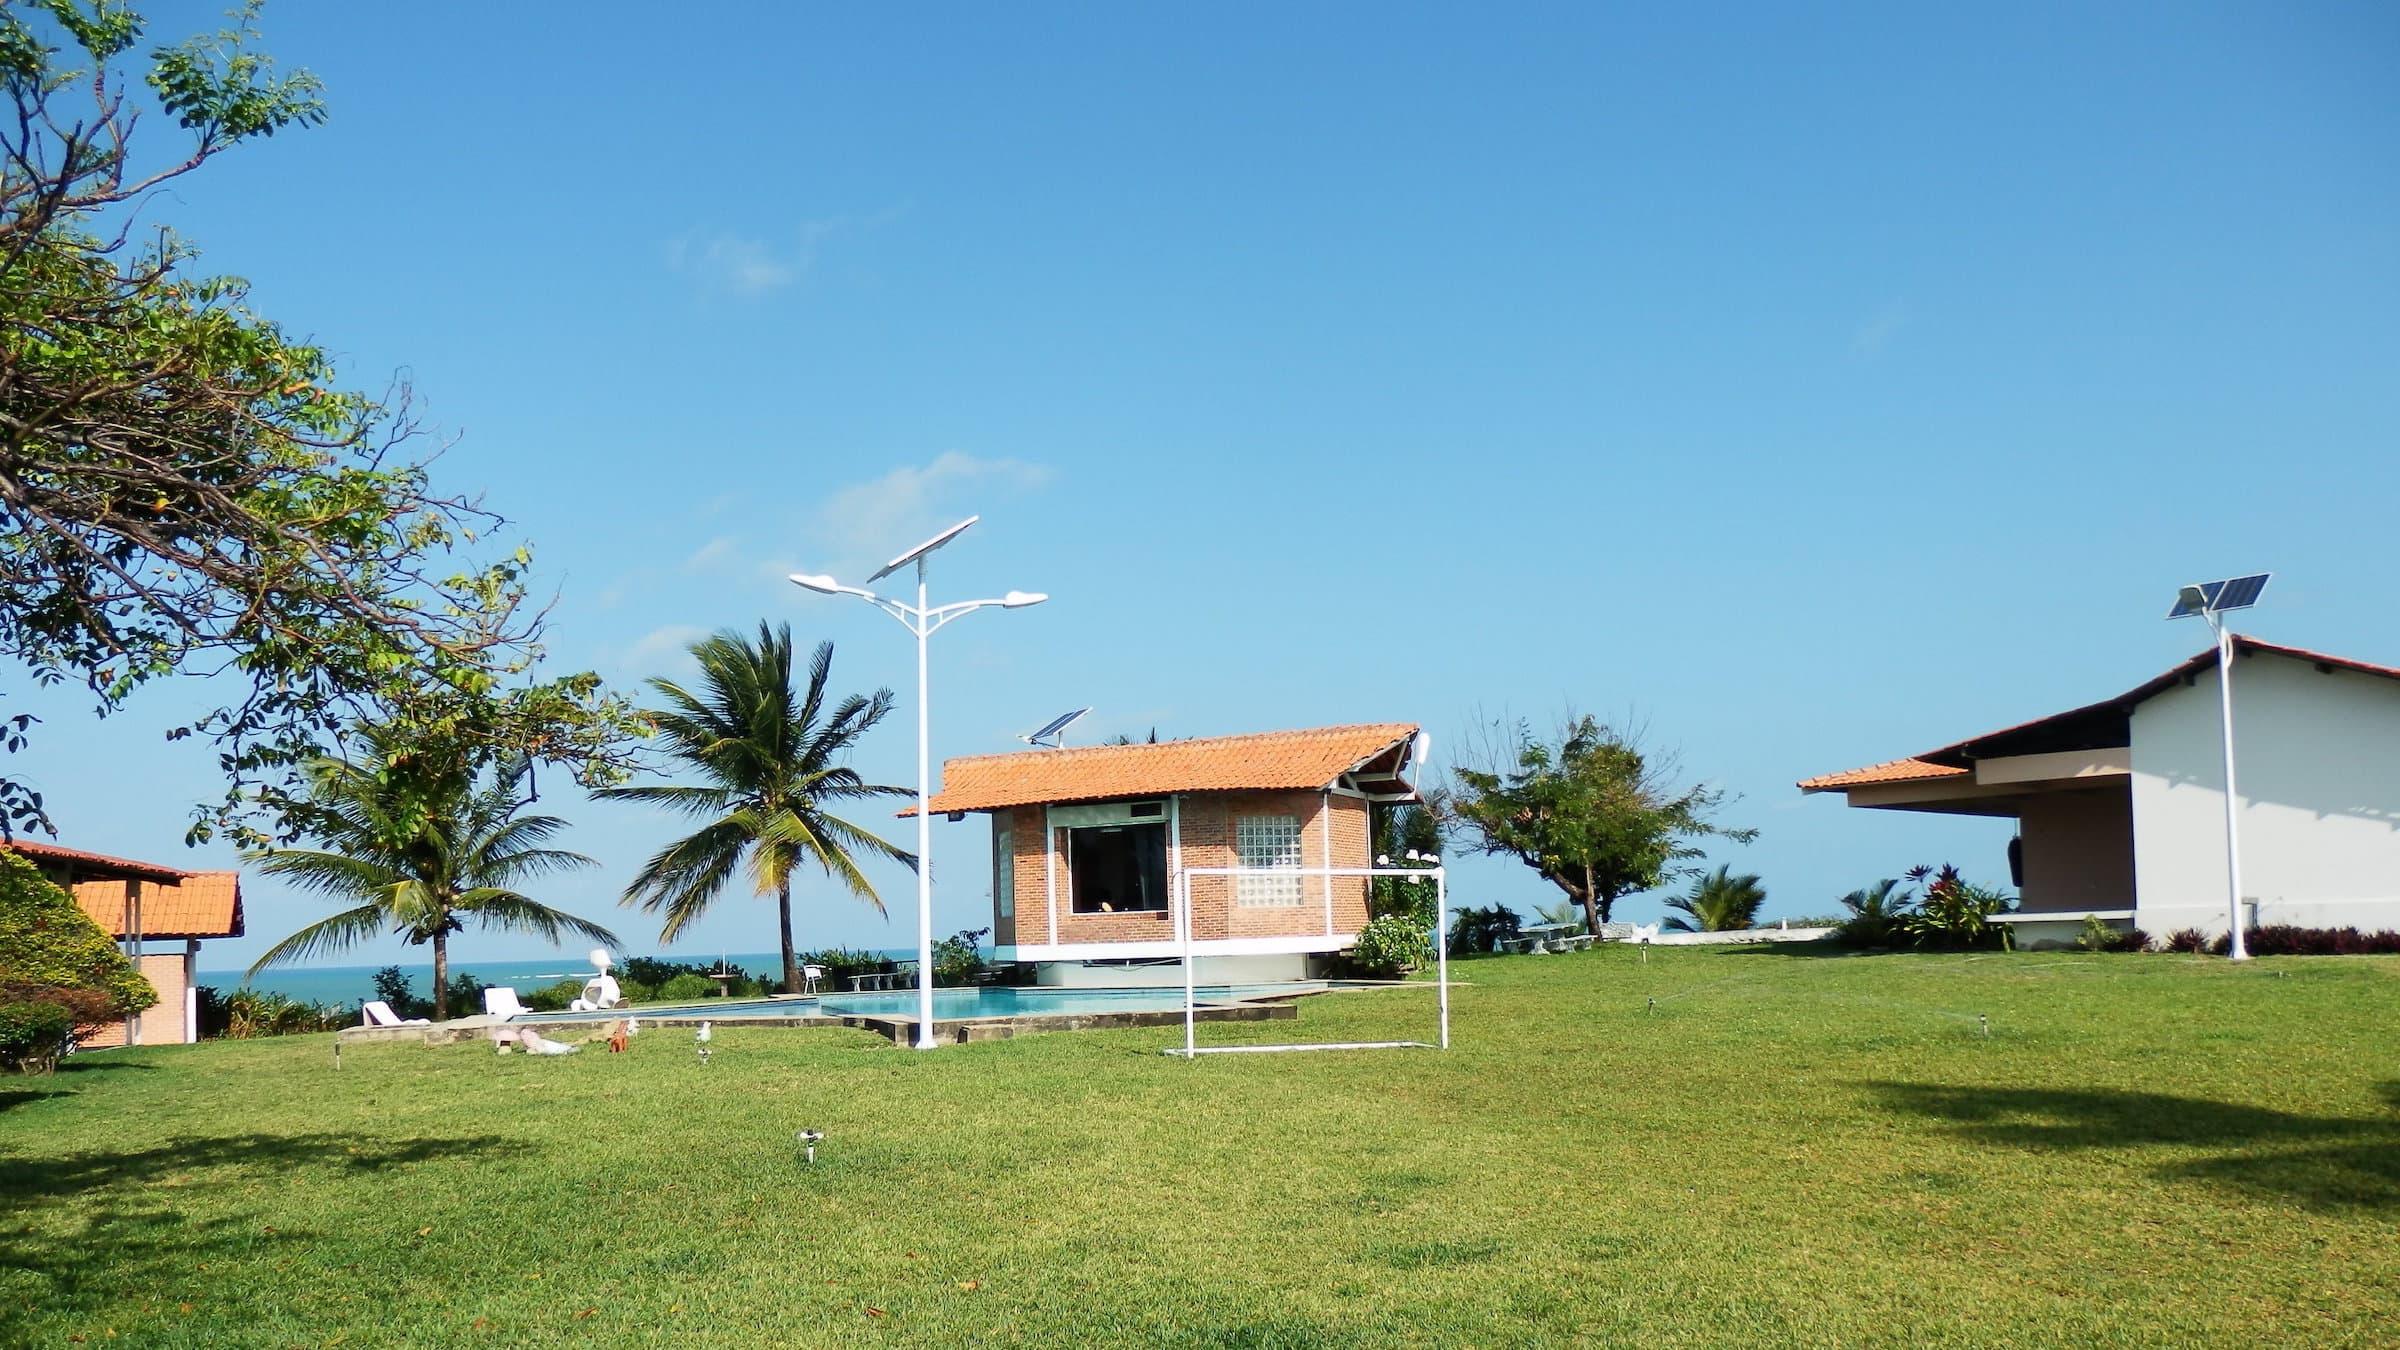 solar-powered-street-light-30-watts-in-Brazil